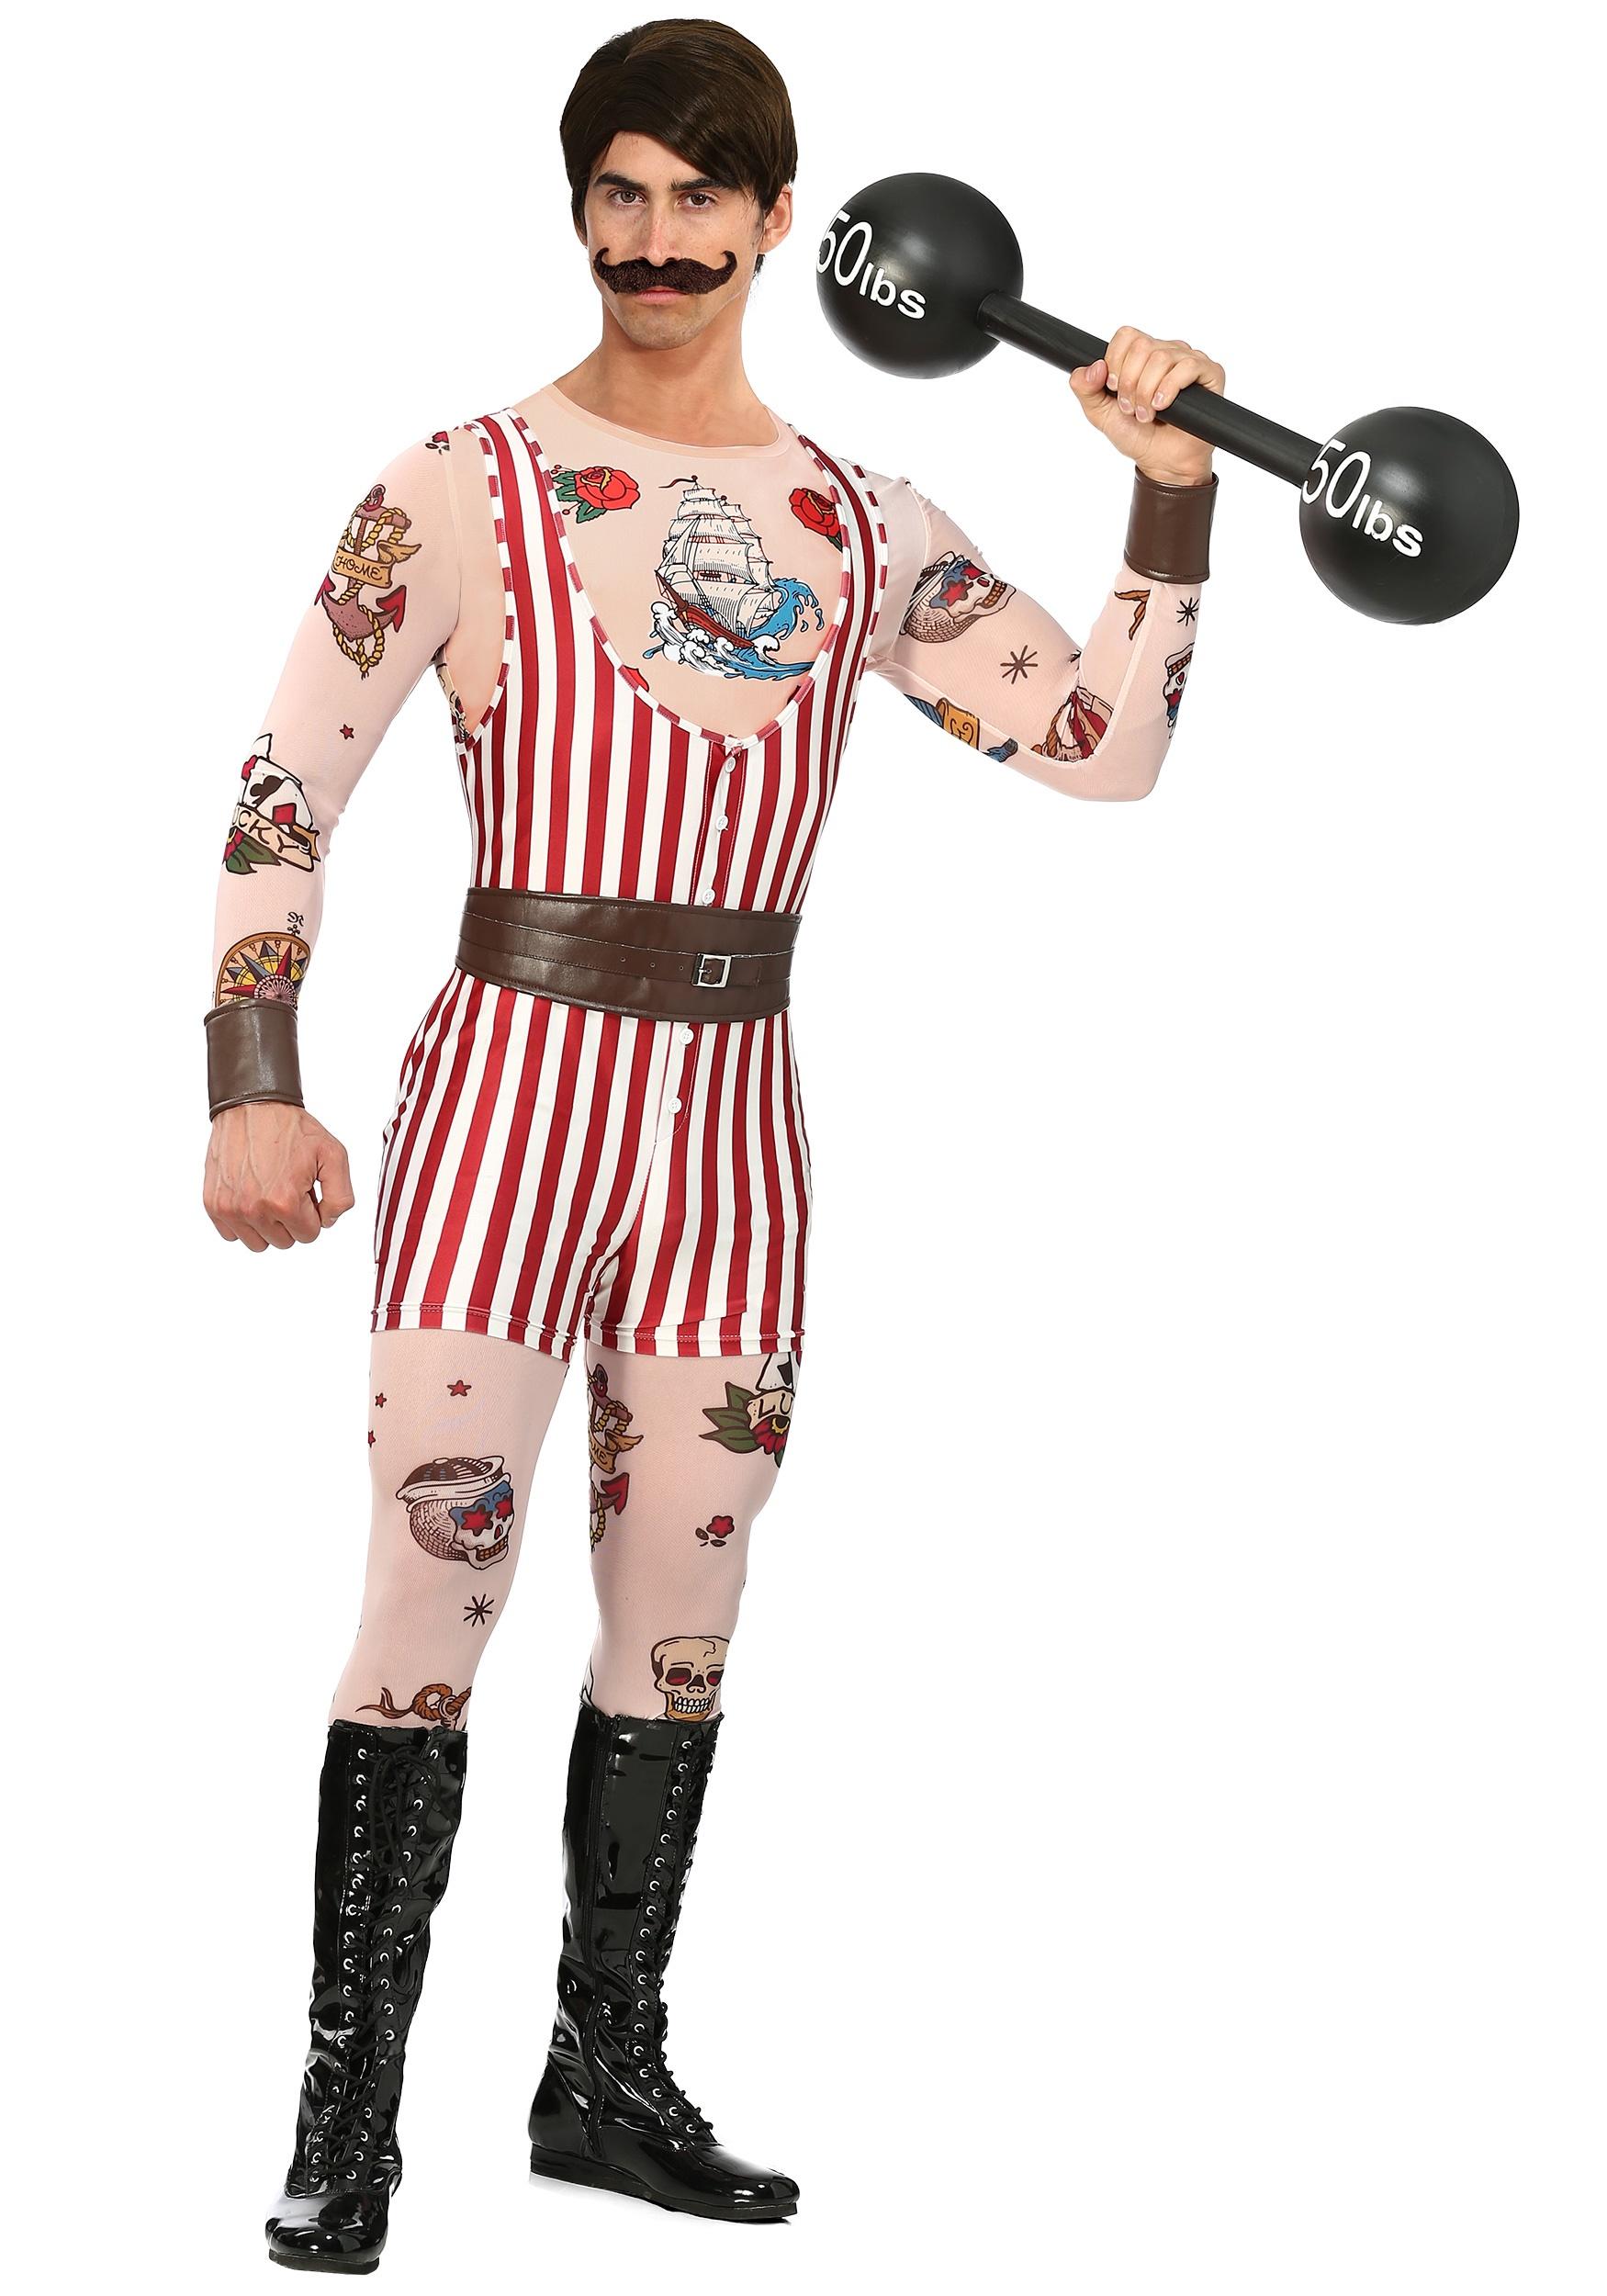 Vintage Strongman Costume for Men